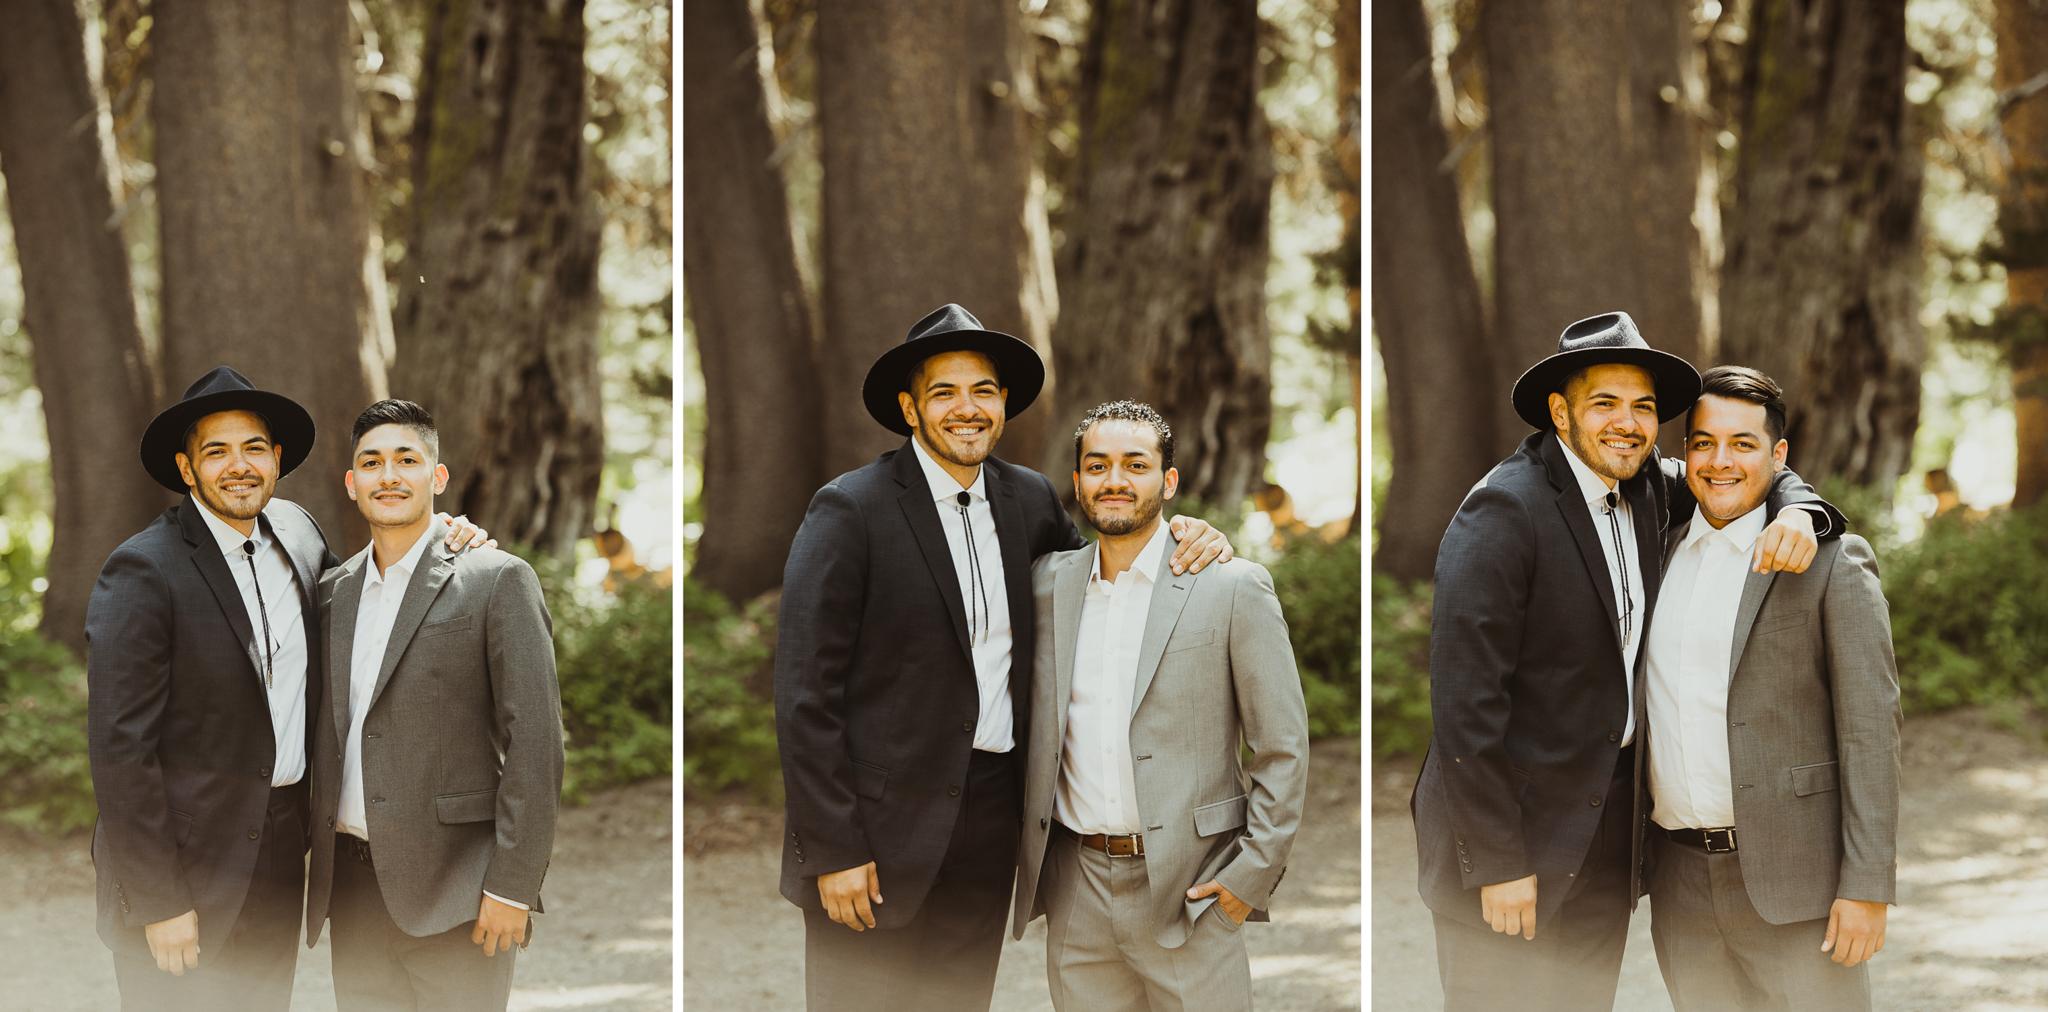 ©Isaiah & Taylor Photography -The Hideout Wedding, Kirkwood California, Lake Tahoe Wedding Photographer-124.jpg